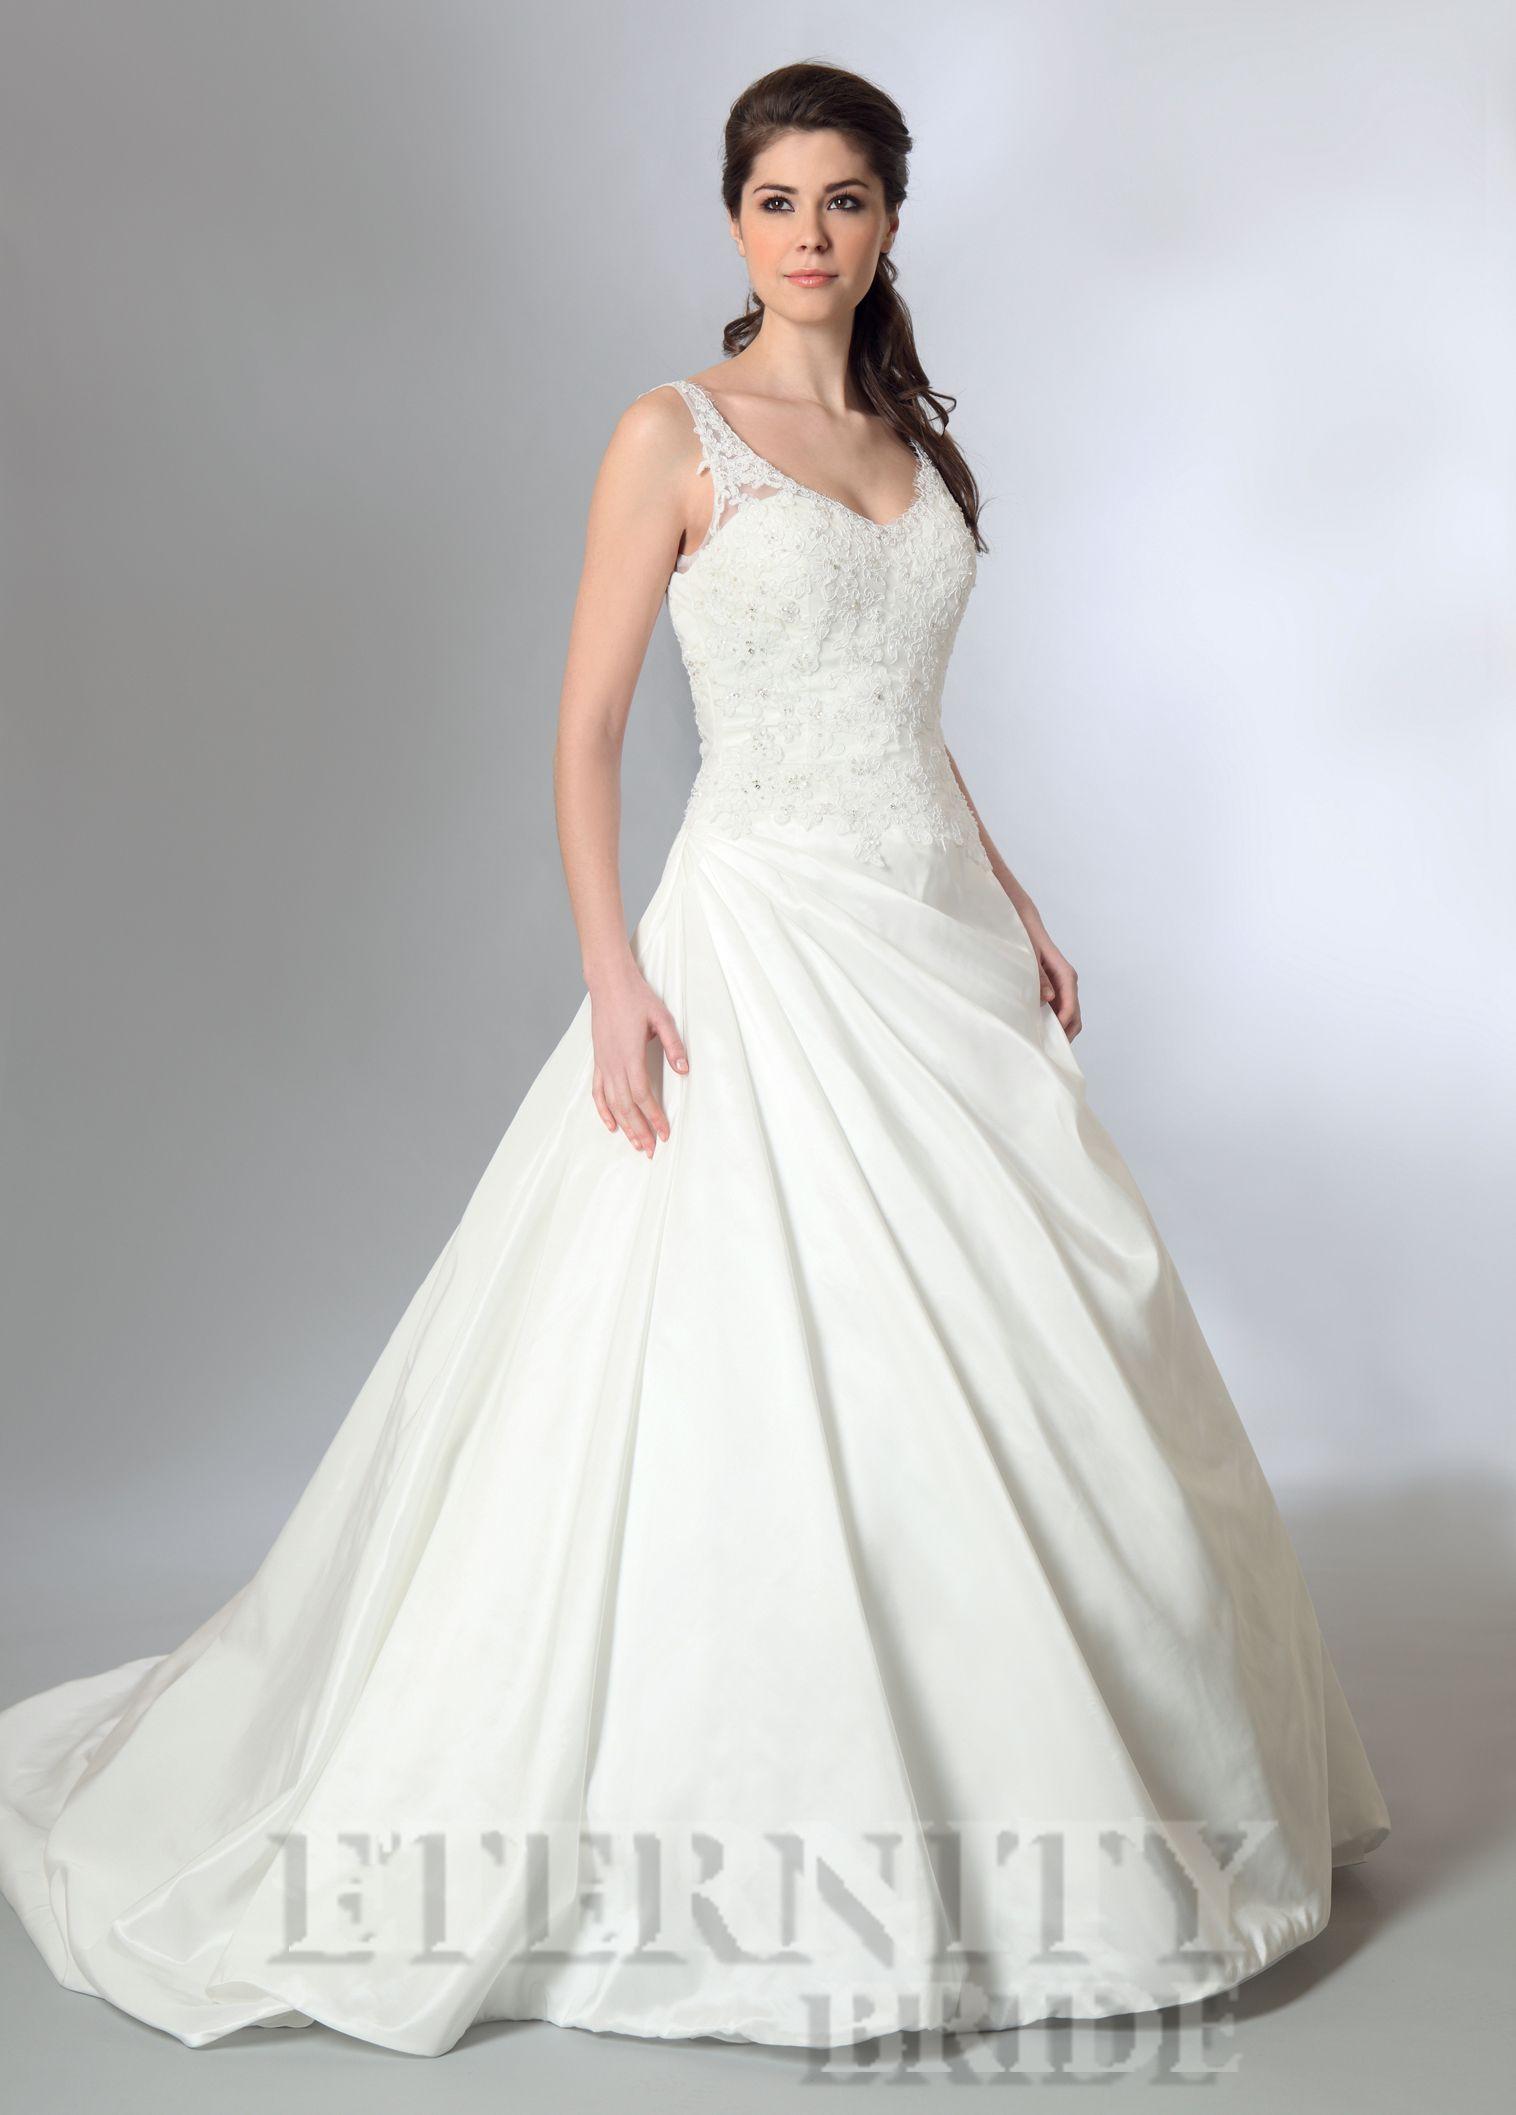 Eternity Bridal   Eternity Bridal Gowns   Pinterest   Bridal gowns ...